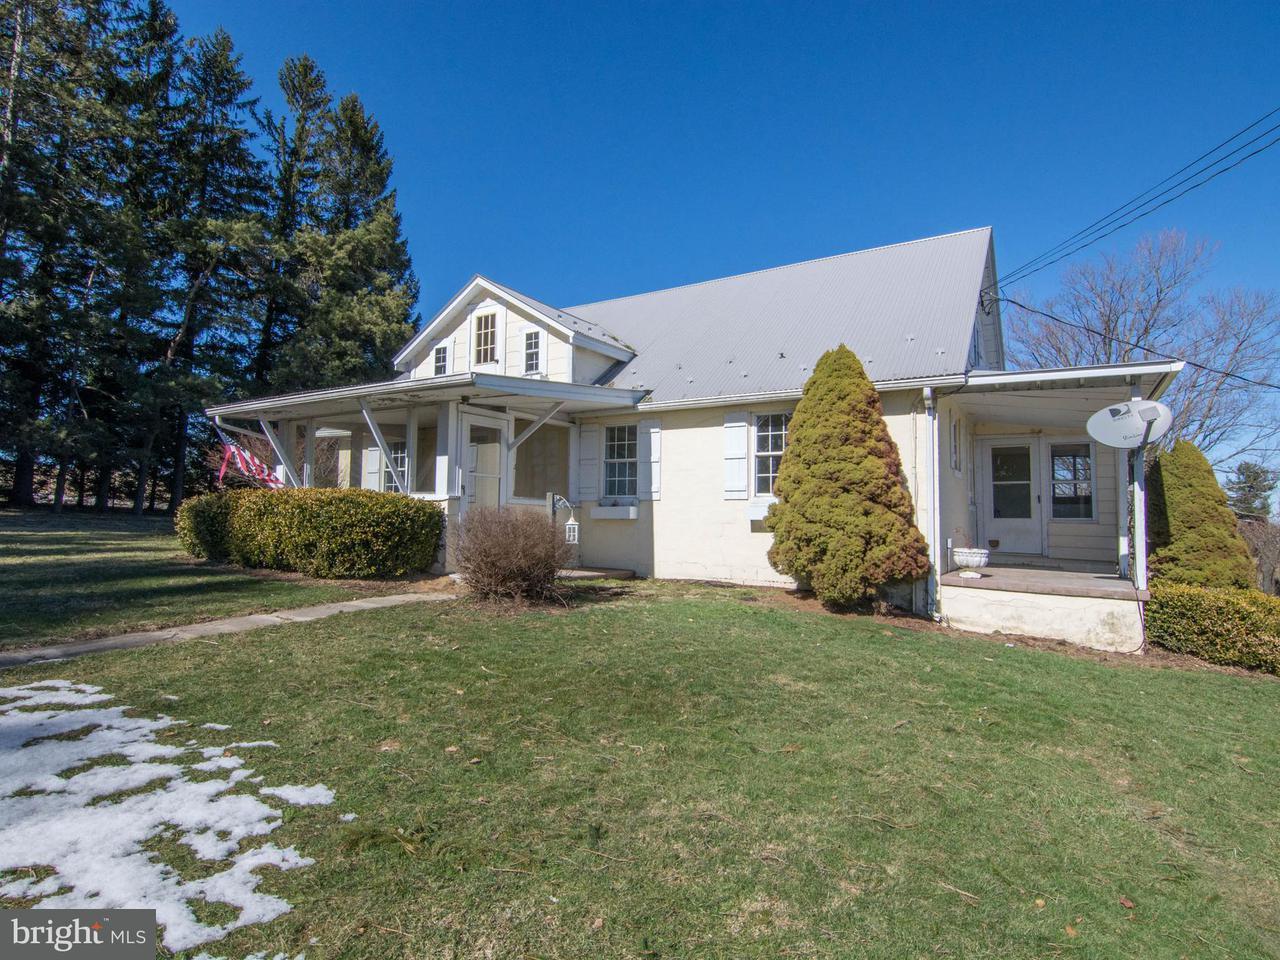 Farm for Sale at 196 Maynardier Ridge Rd Bittinger, Maryland 21522 United States